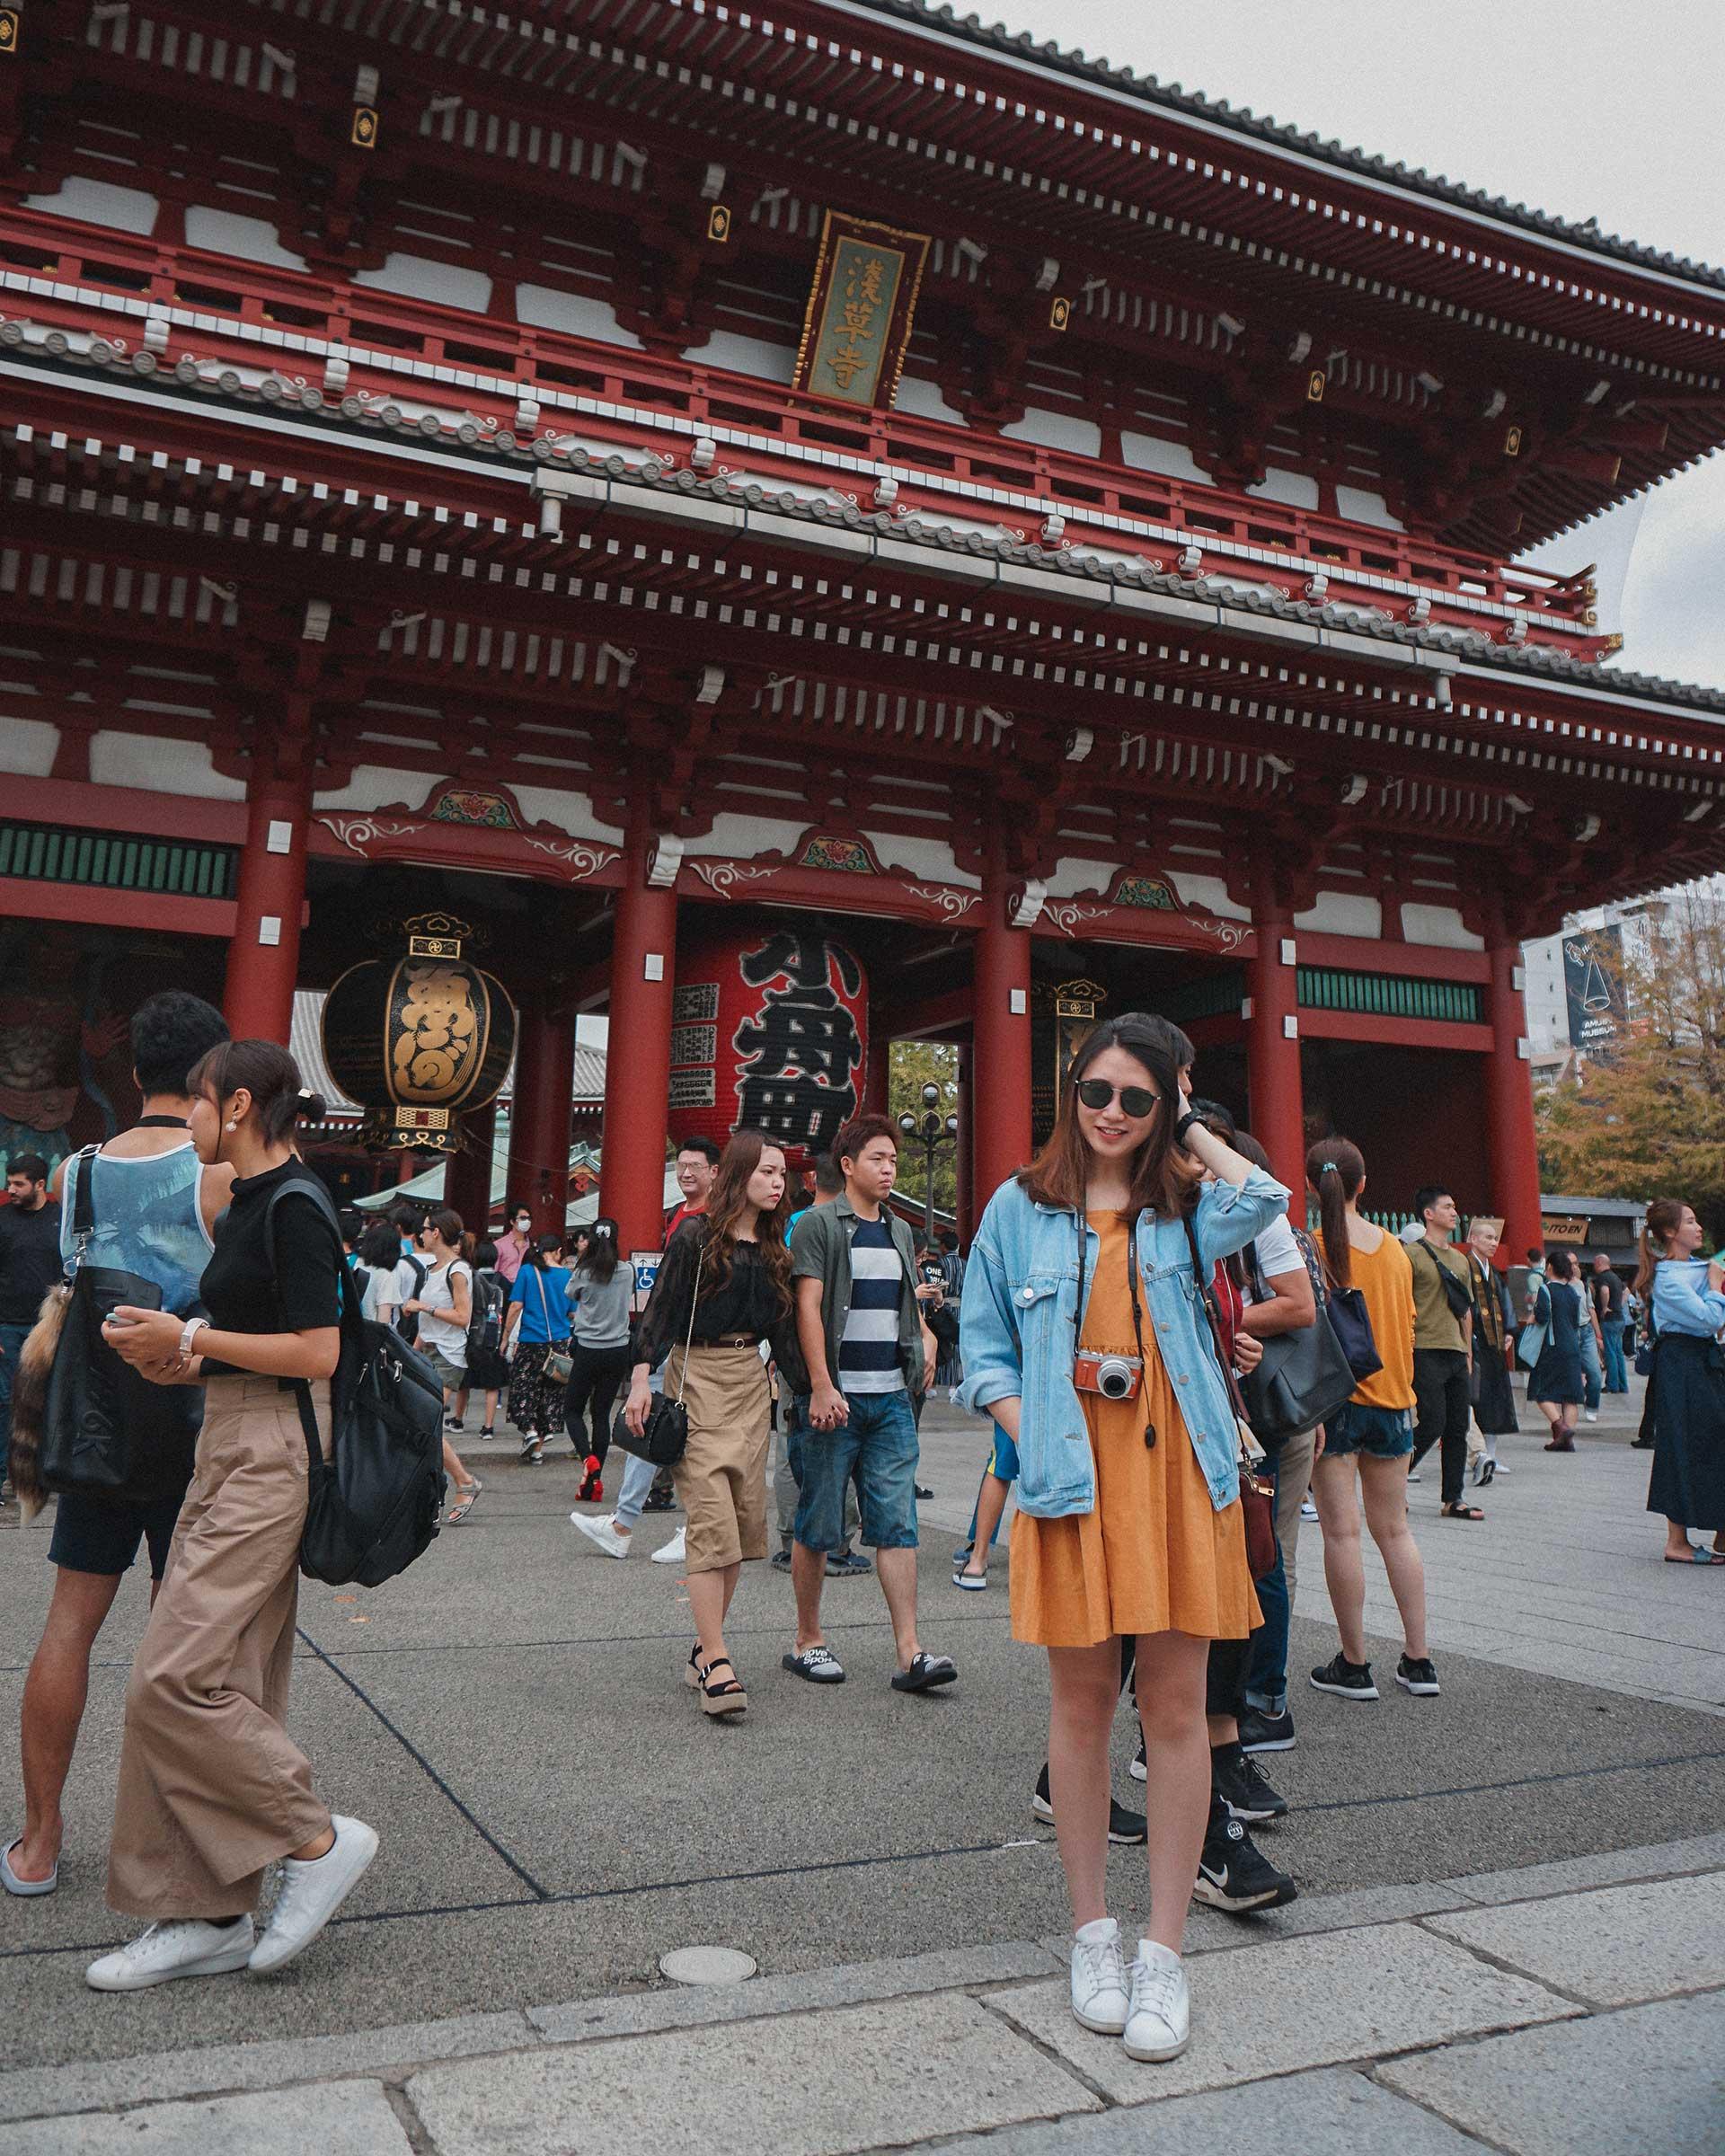 FattyBonbon headache pose in front of Hōzōmon Gate (宝蔵門)